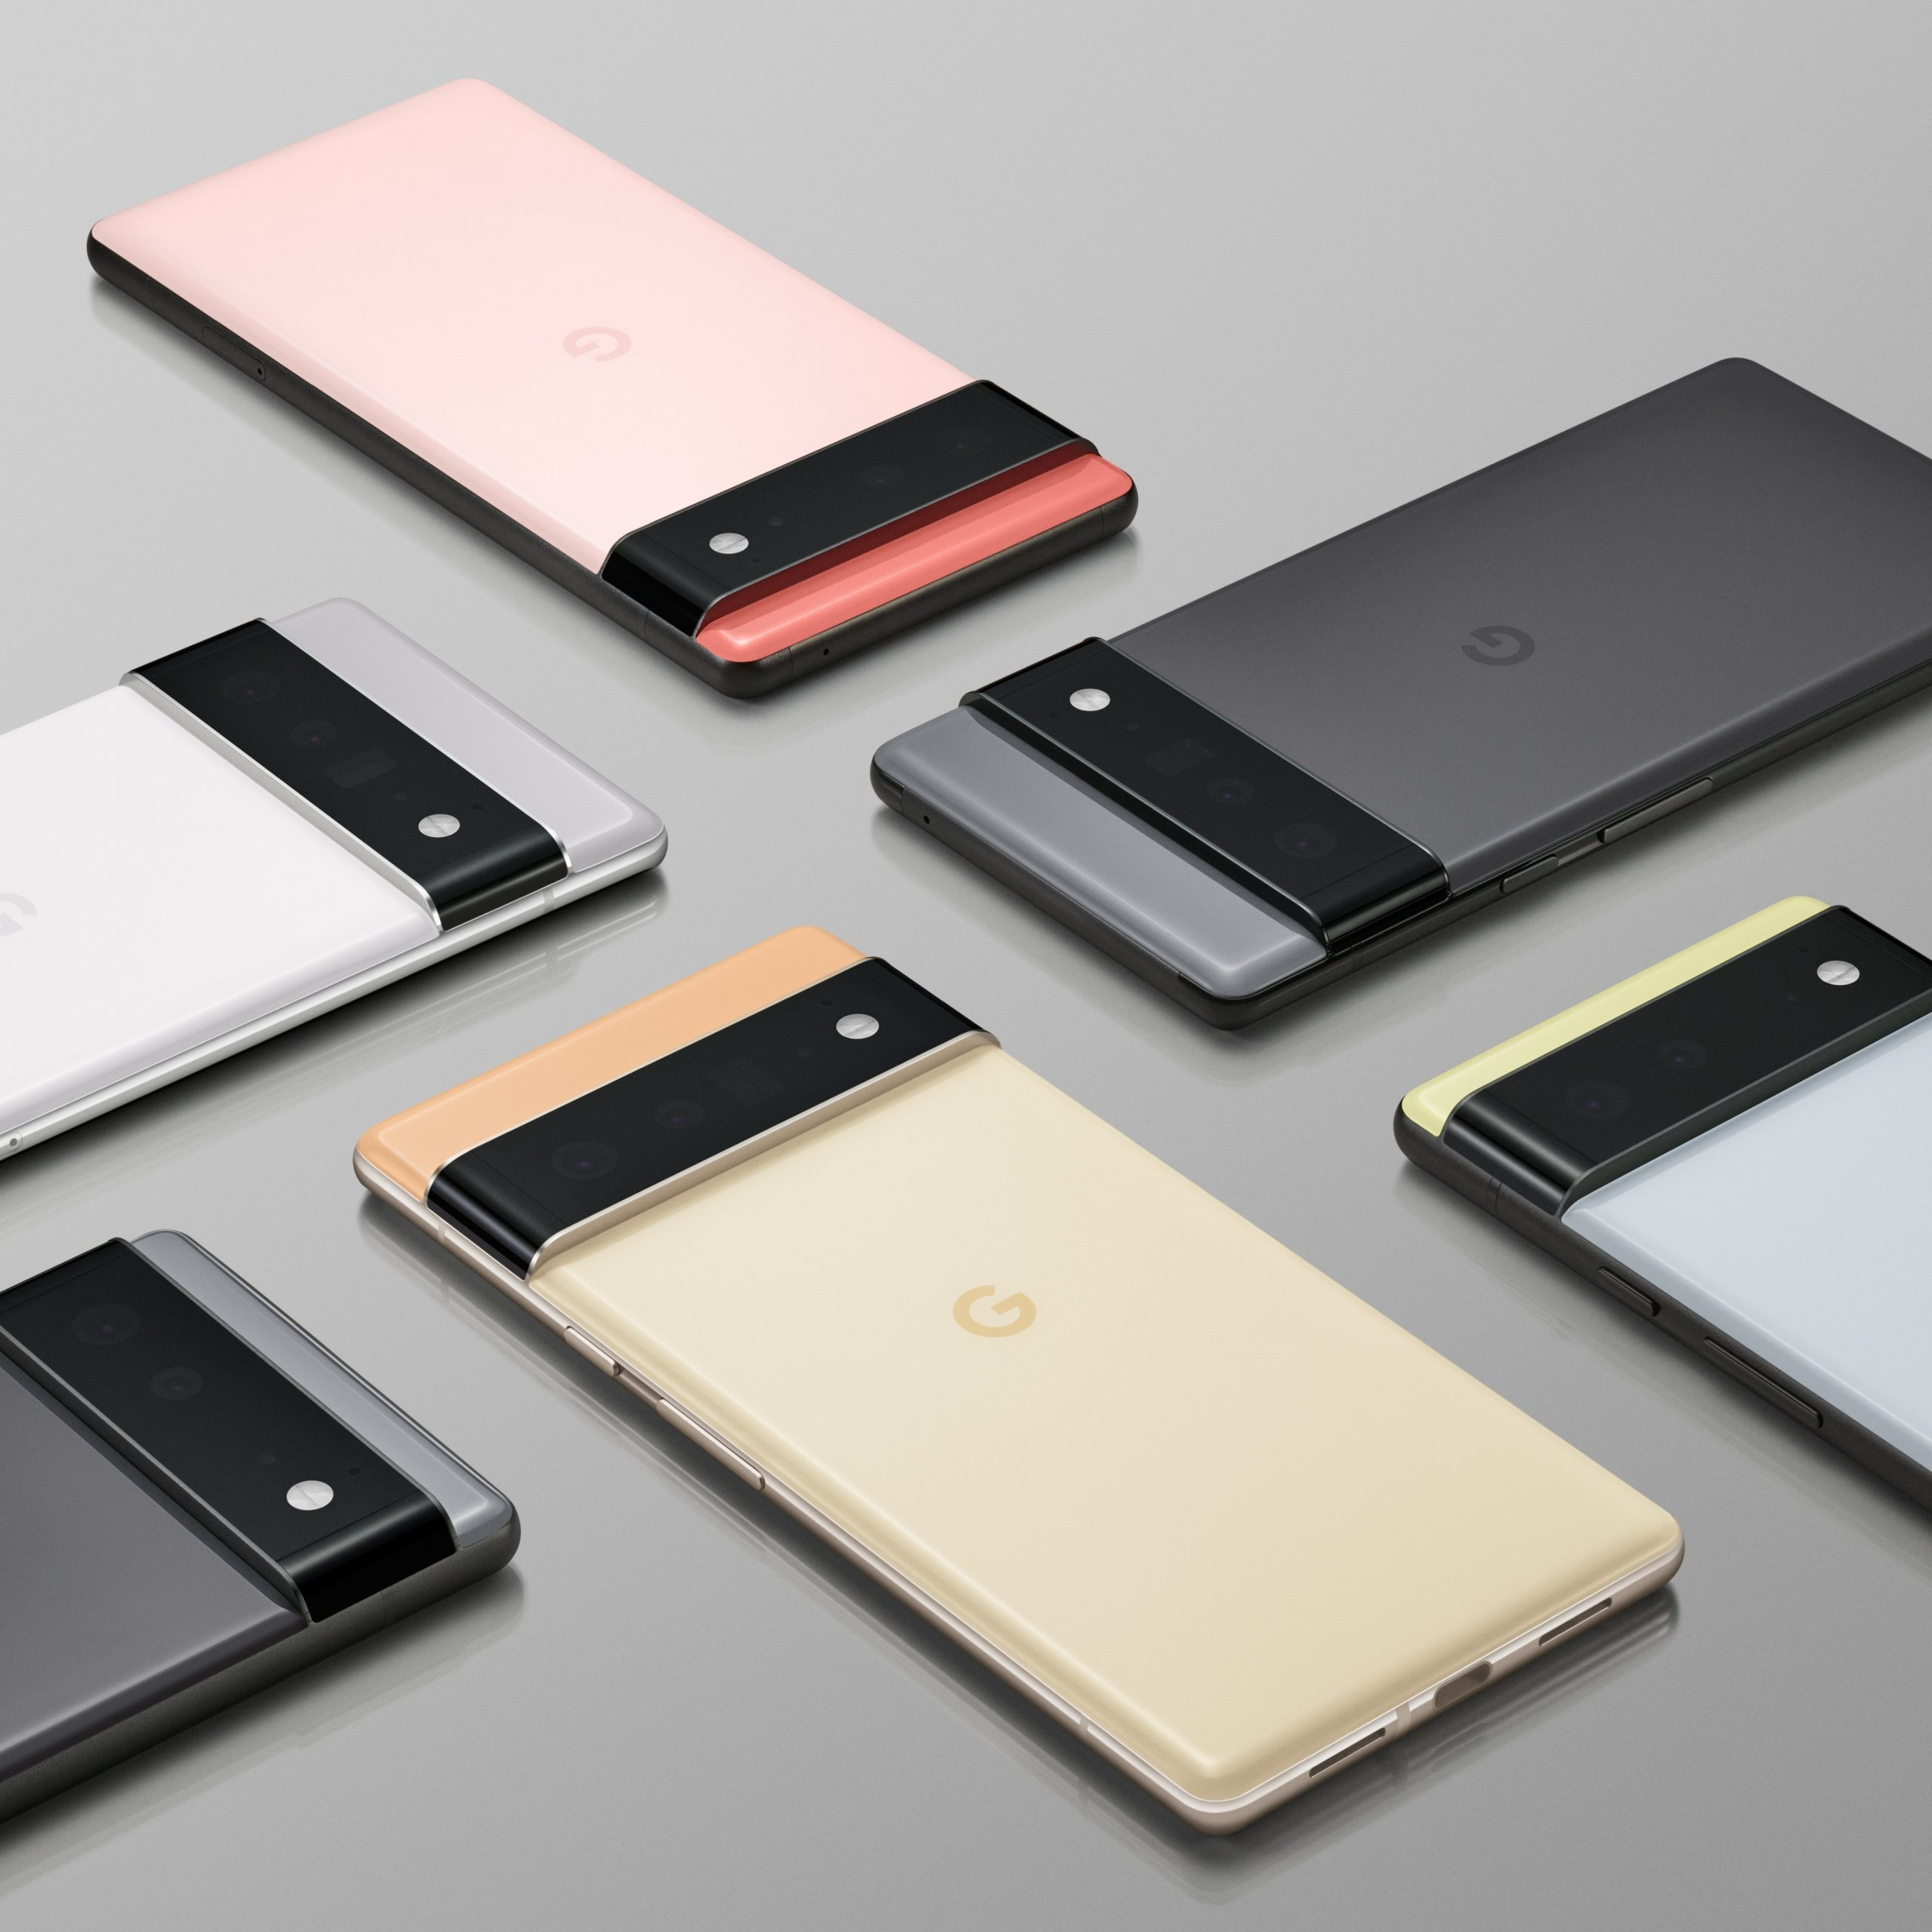 Google Pixel 6 series featured